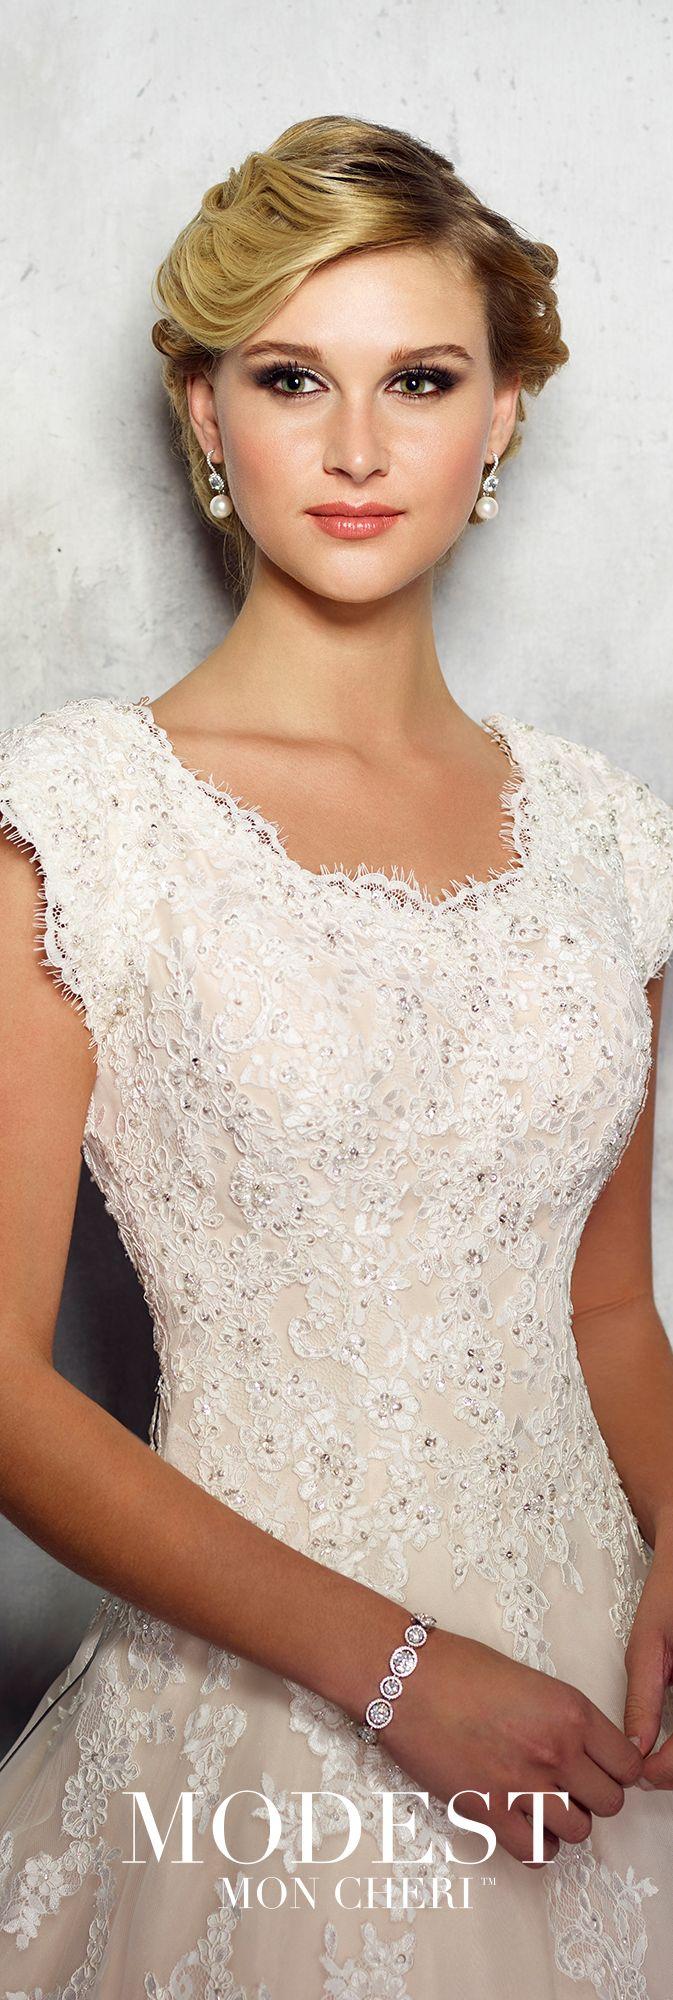 Lace cap sleeve a line wedding dress  Lace u Organza ALine Wedding Gown  Modest by Mon Cheri TR